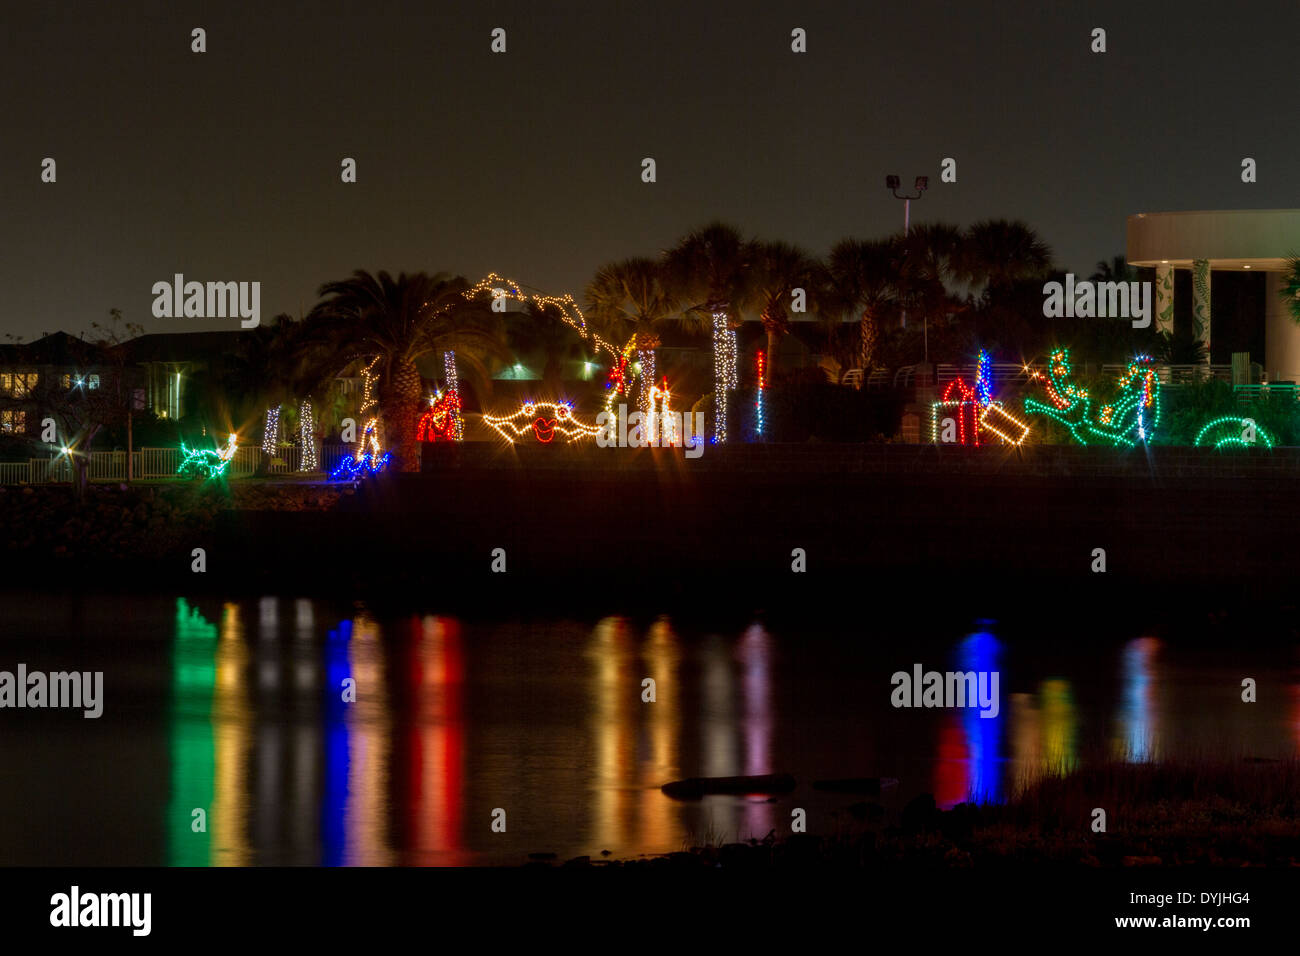 Moody Gardens Christmas.Christmas Lights And Displays At Moody Gardens In Galveston